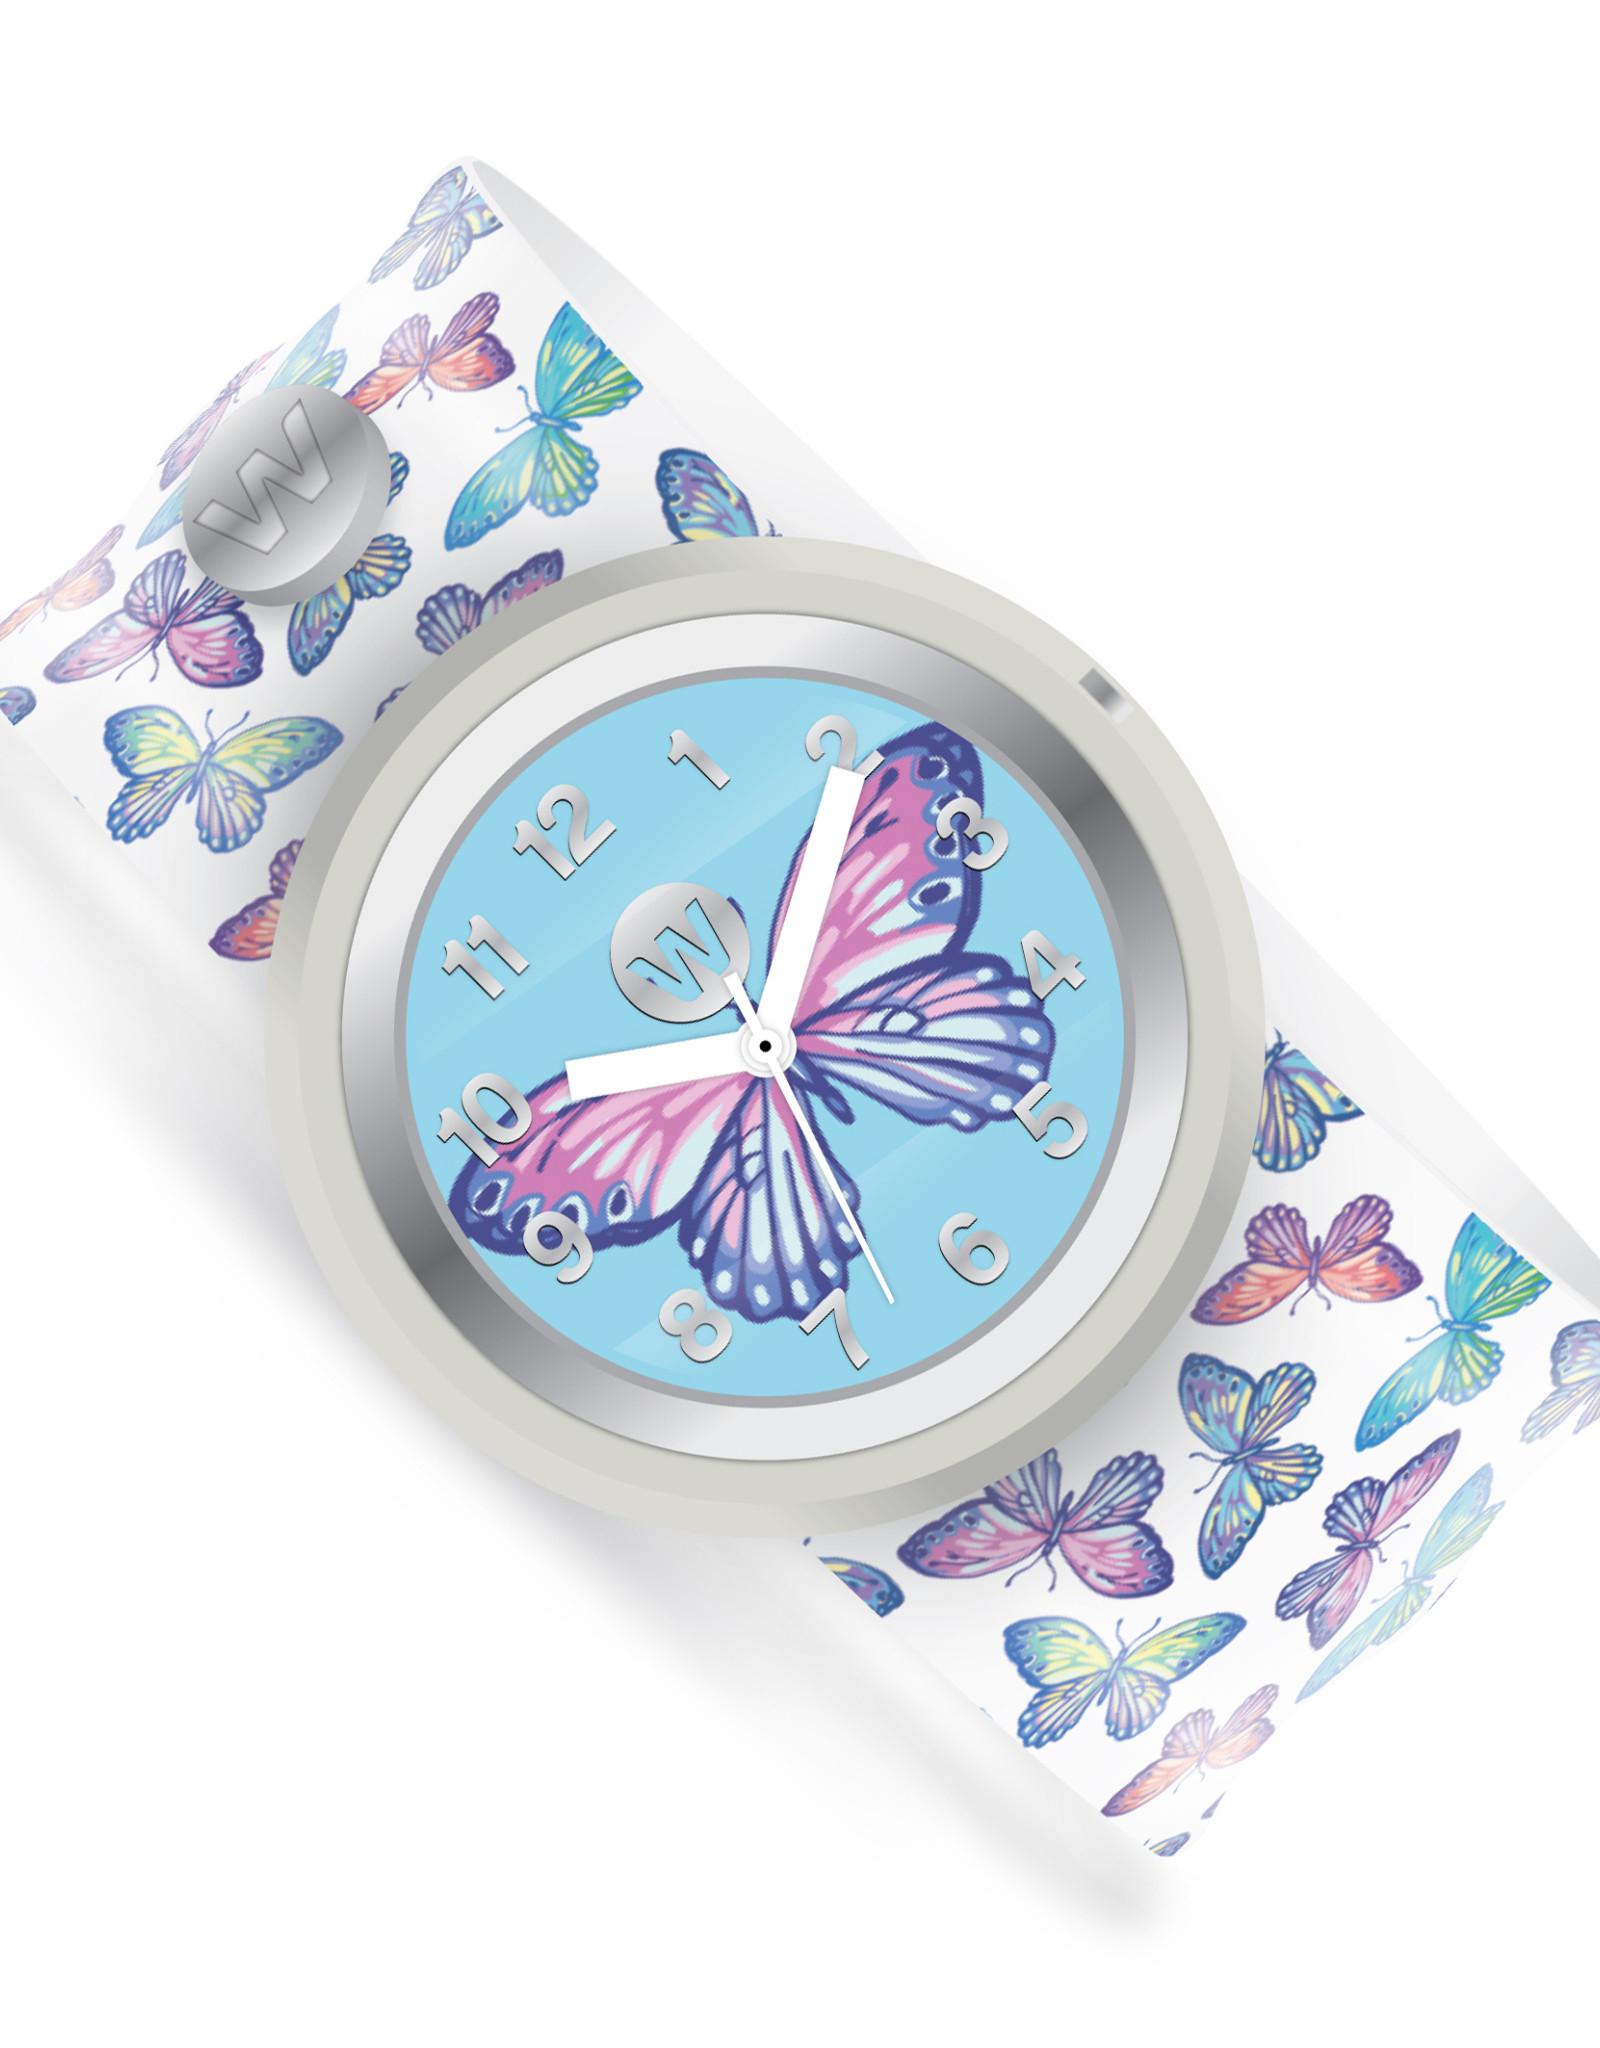 Watchitude Watchitude Slap Watch- Butterfly Bash